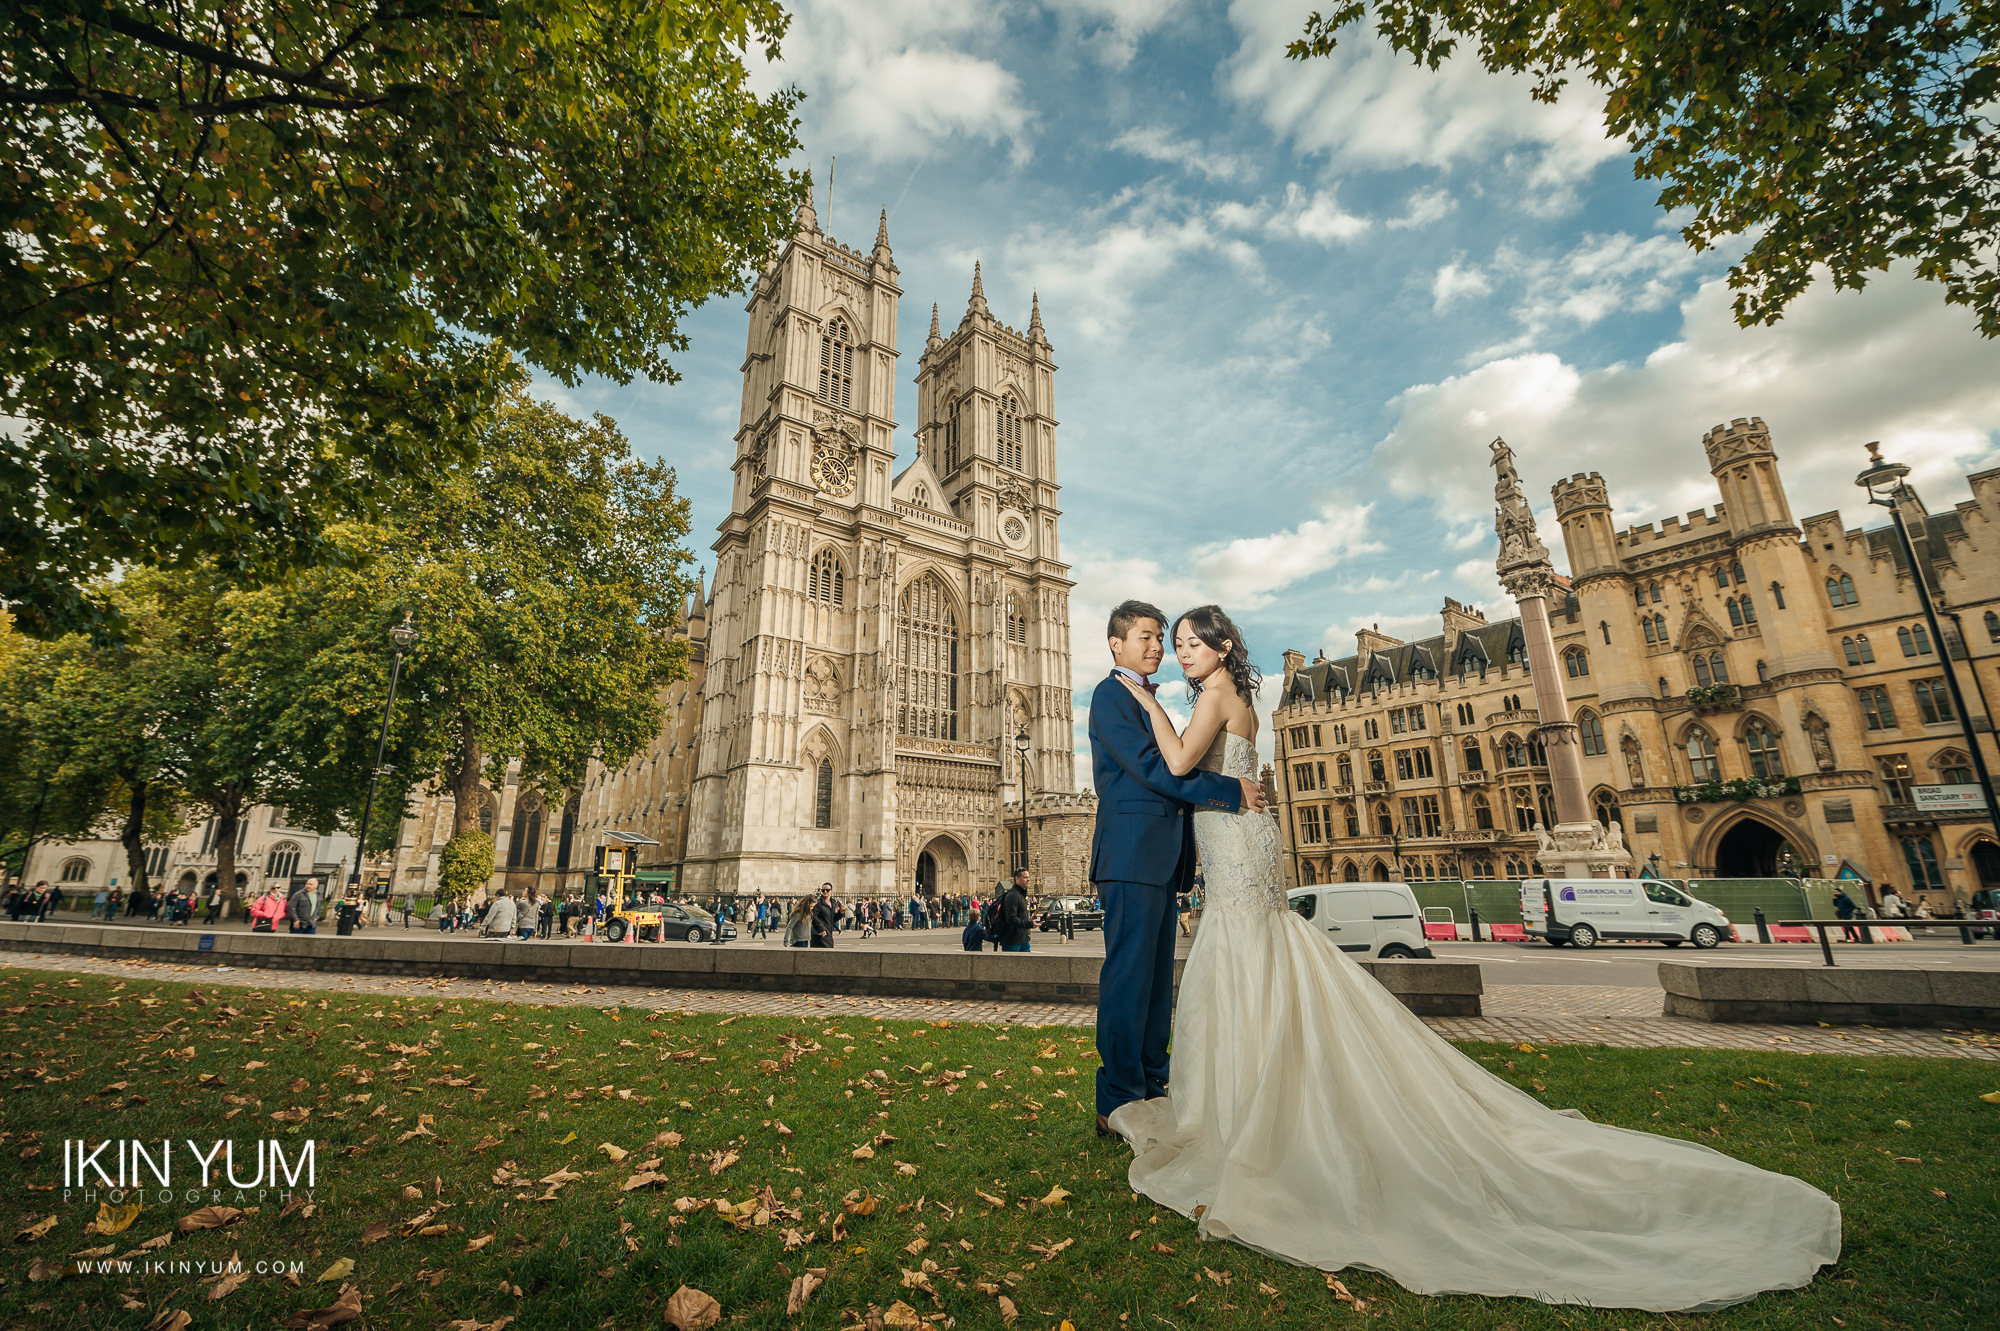 Chloe & Carlos Pre-Wedding Shoot- Ikin Yum Photography-0090.jpg